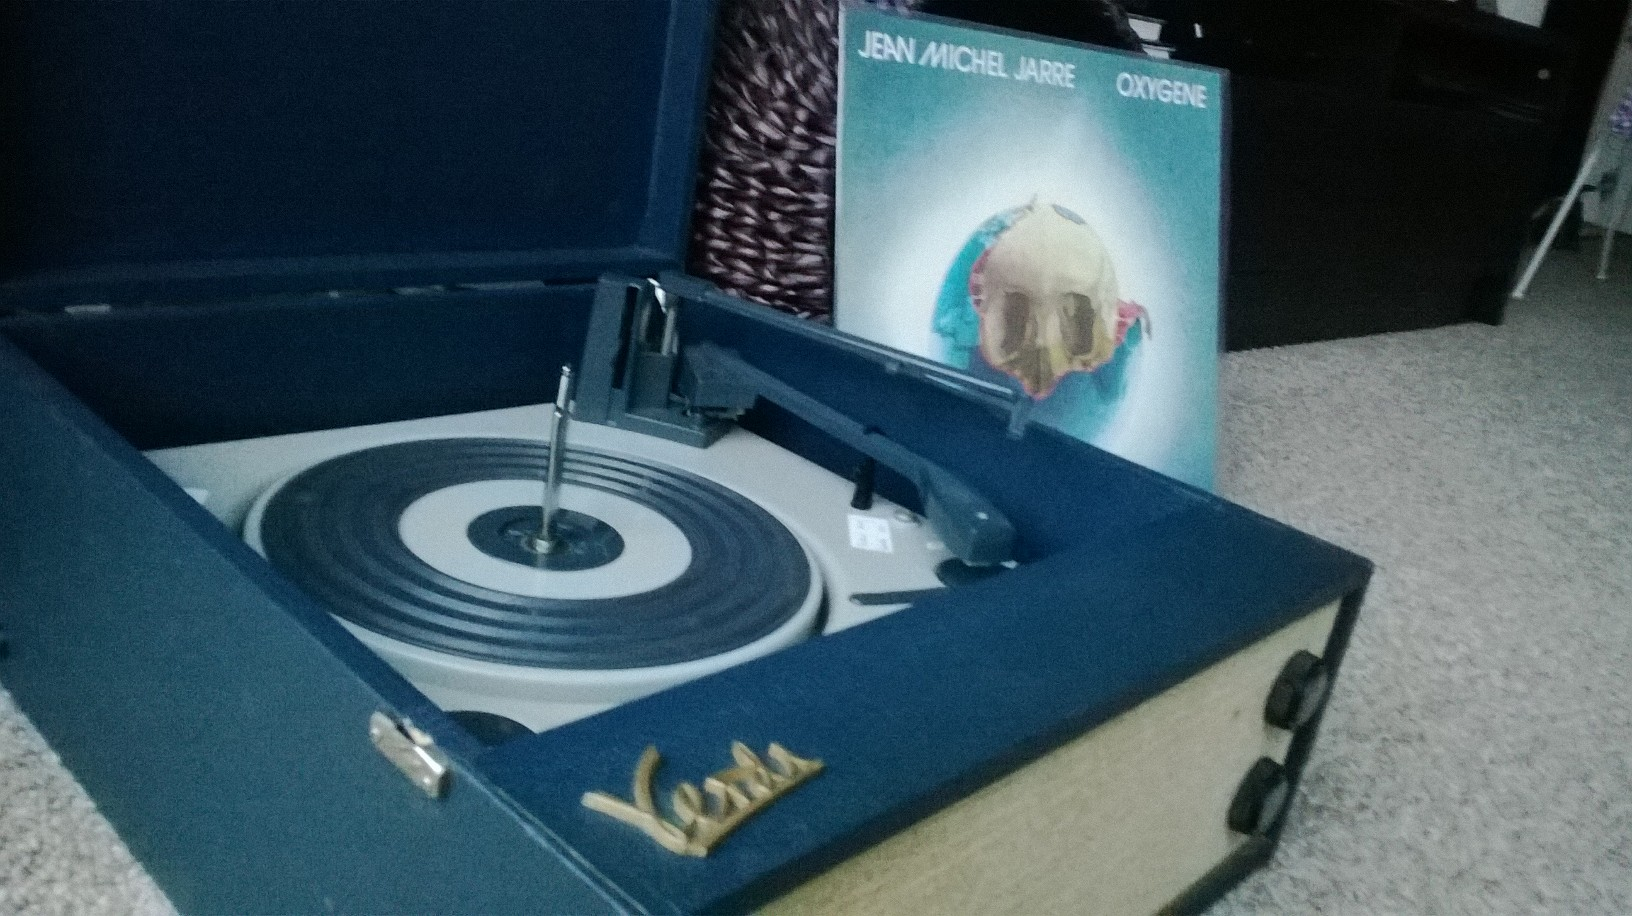 My lovely Verdi record player and the amazing Jean Michel Jarre 'Oxygene' album